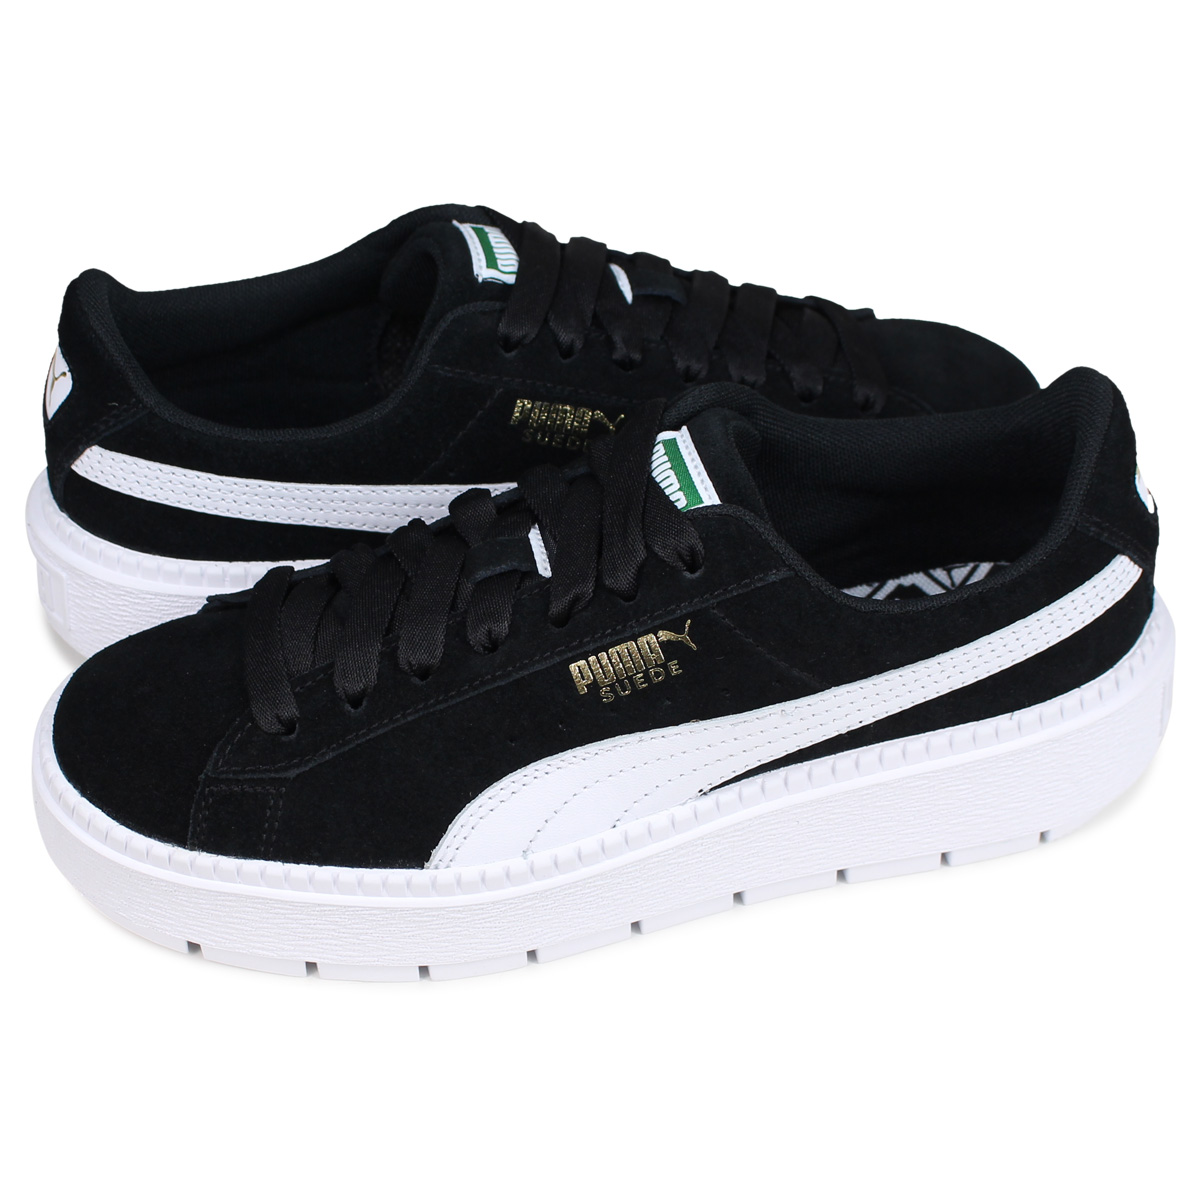 premium selection 19bd3 4b468 PUMA WMNS SUEDE PLATFORM TRACE MU Puma suede platform sneakers Lady's  thickness bottom black black 36798001